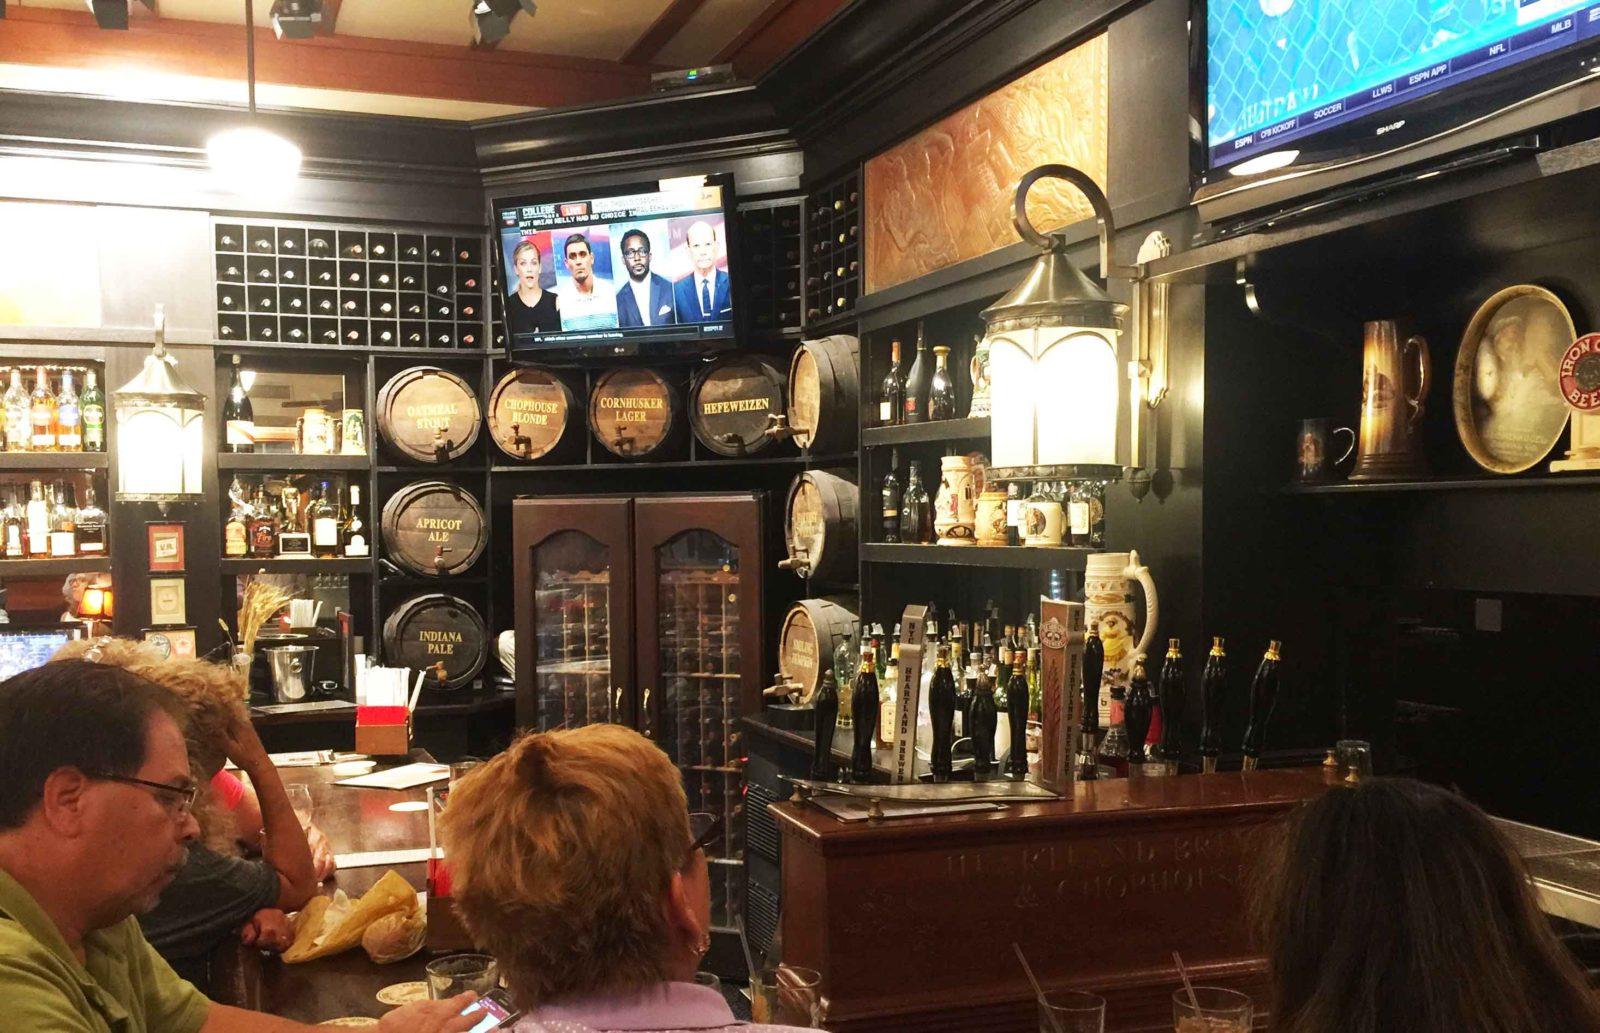 283. Heartland Brewery and Chophouse, New York NY, 2016